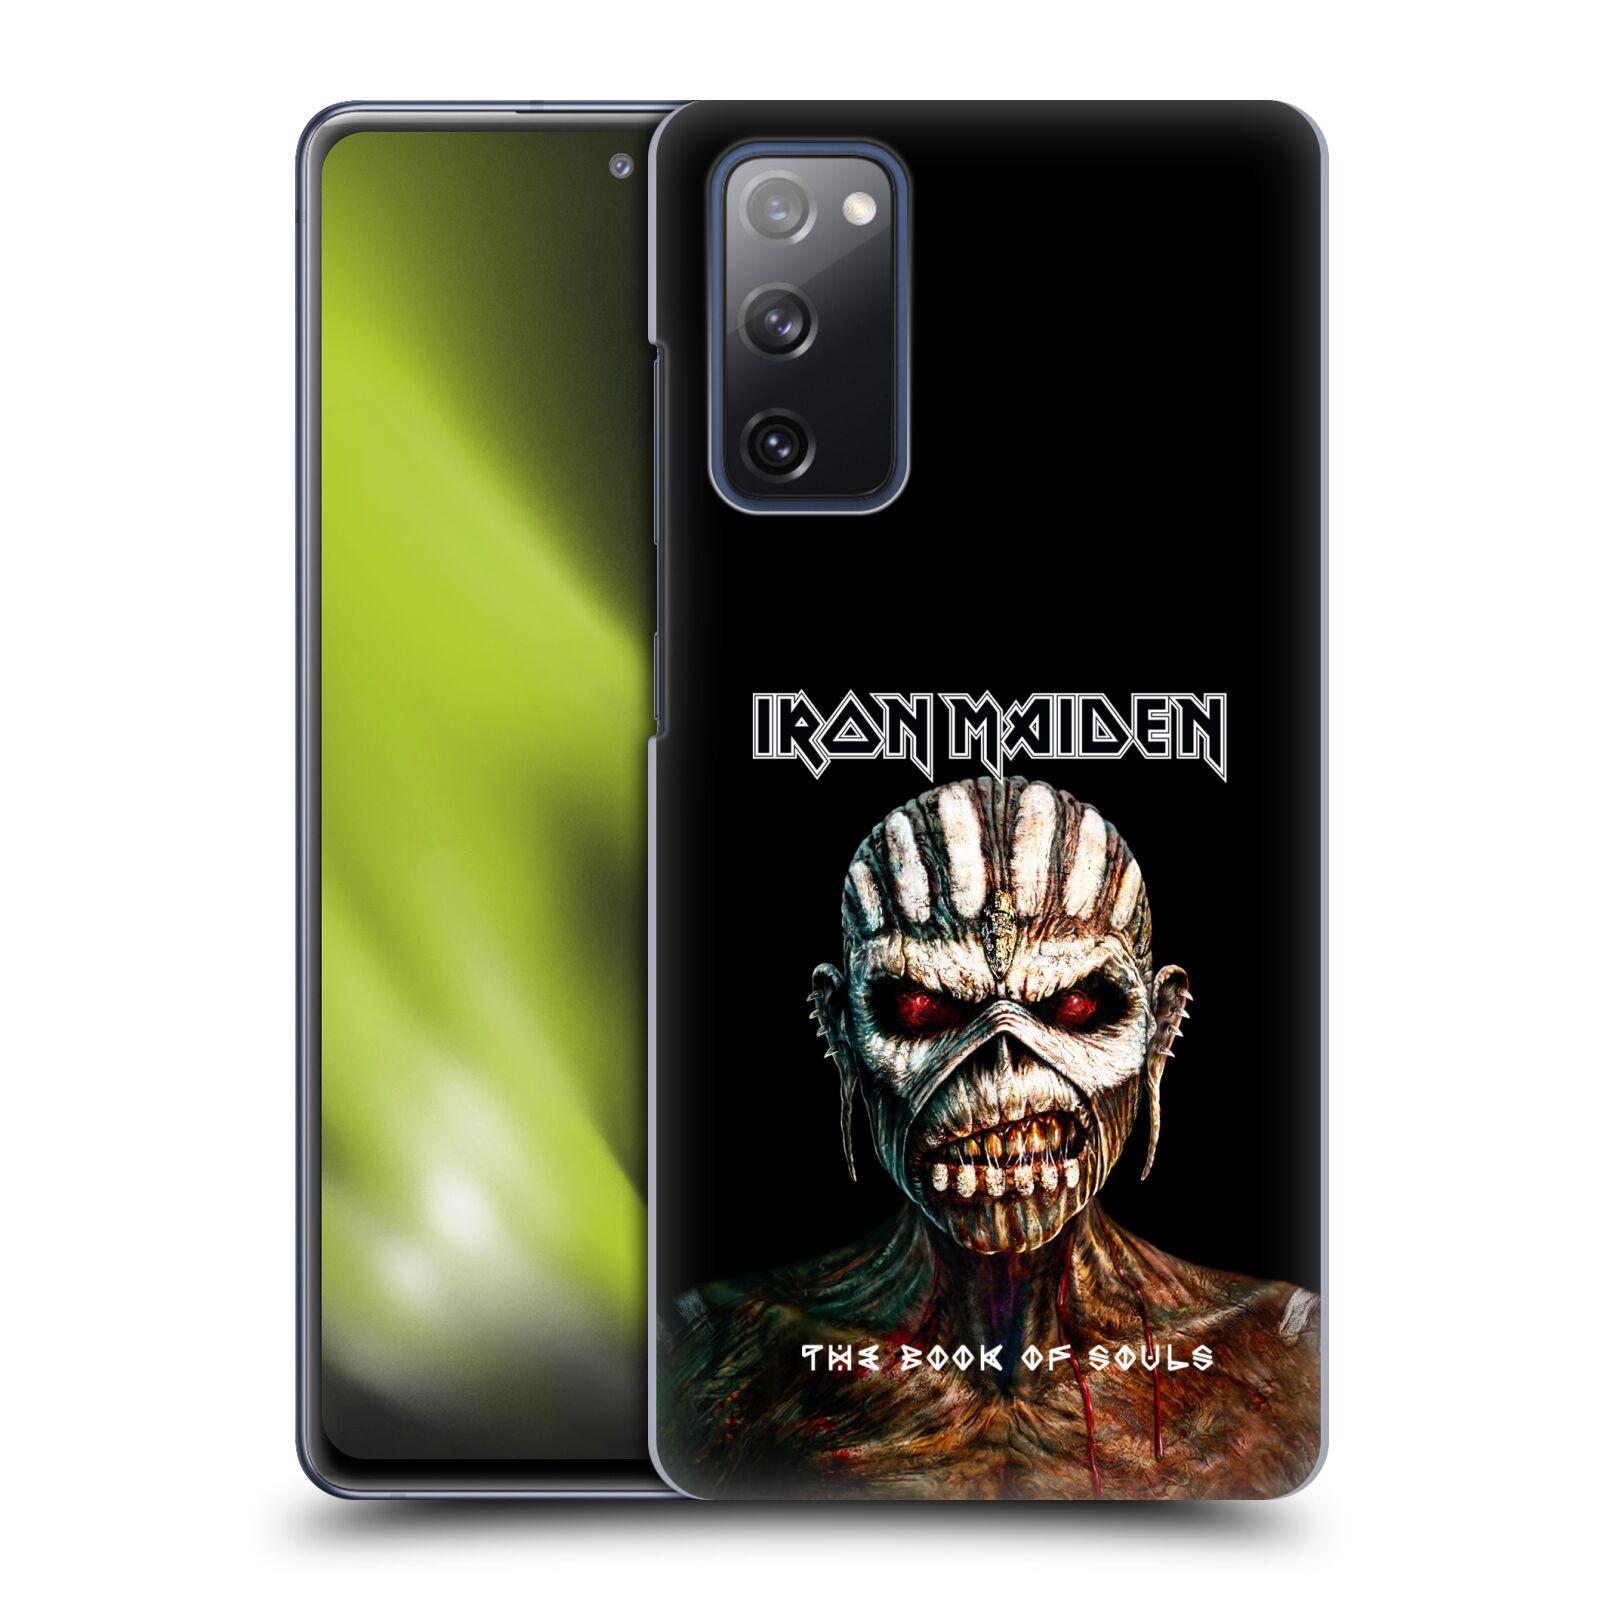 Plastové pouzdro na mobil Samsung Galaxy S20 FE - Head Case - Iron Maiden - The Book Of Souls